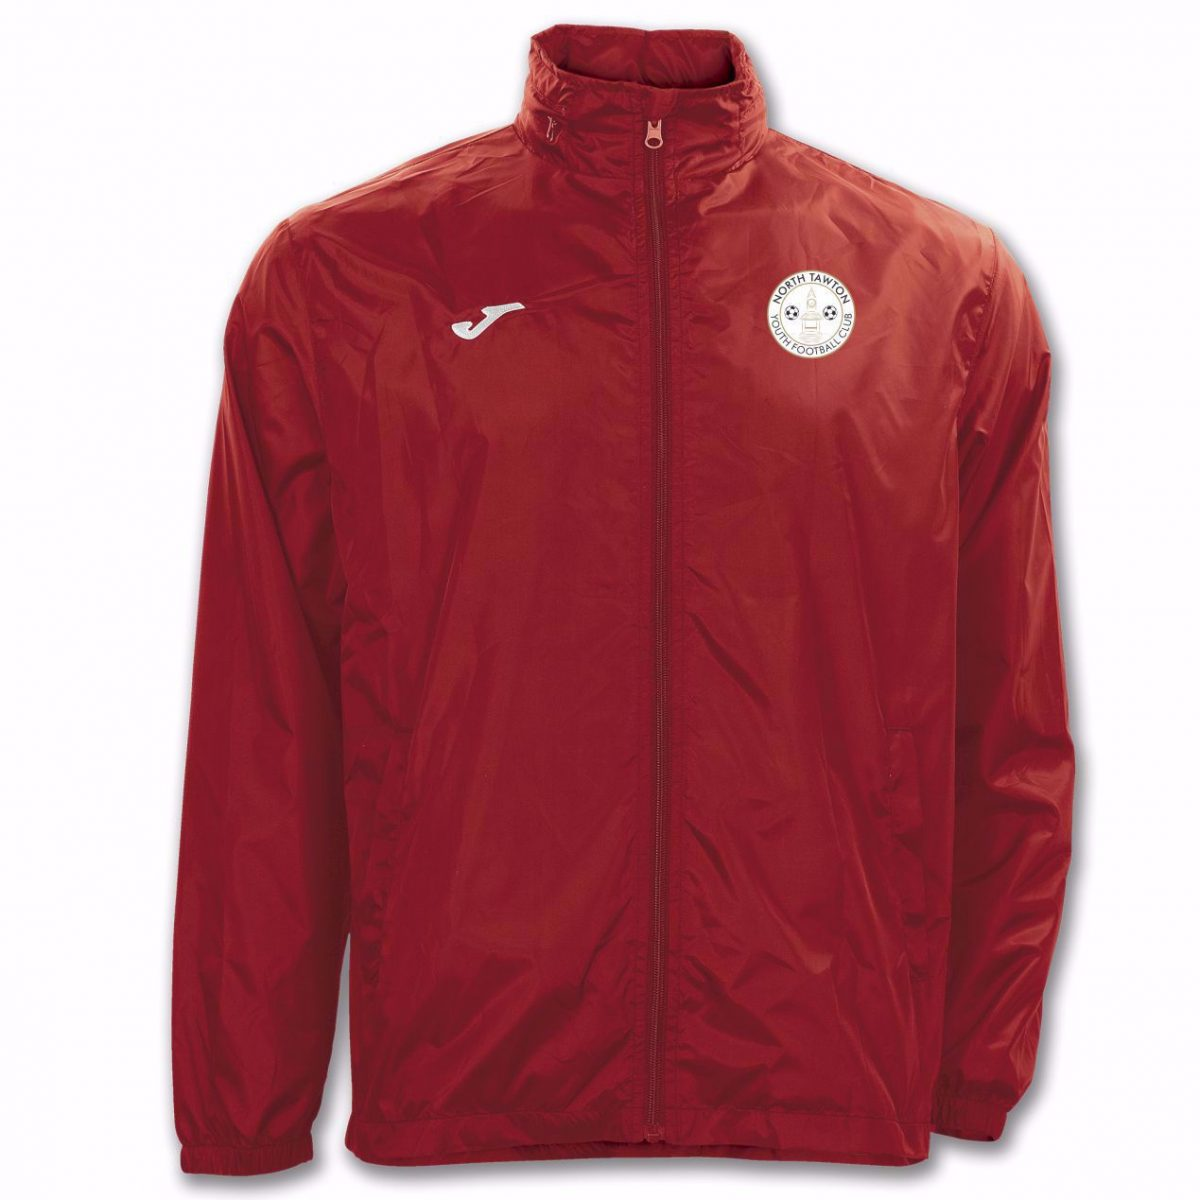 North Tawton Youth Football Club IRIS Rain Jacket 100087.600- ADULT